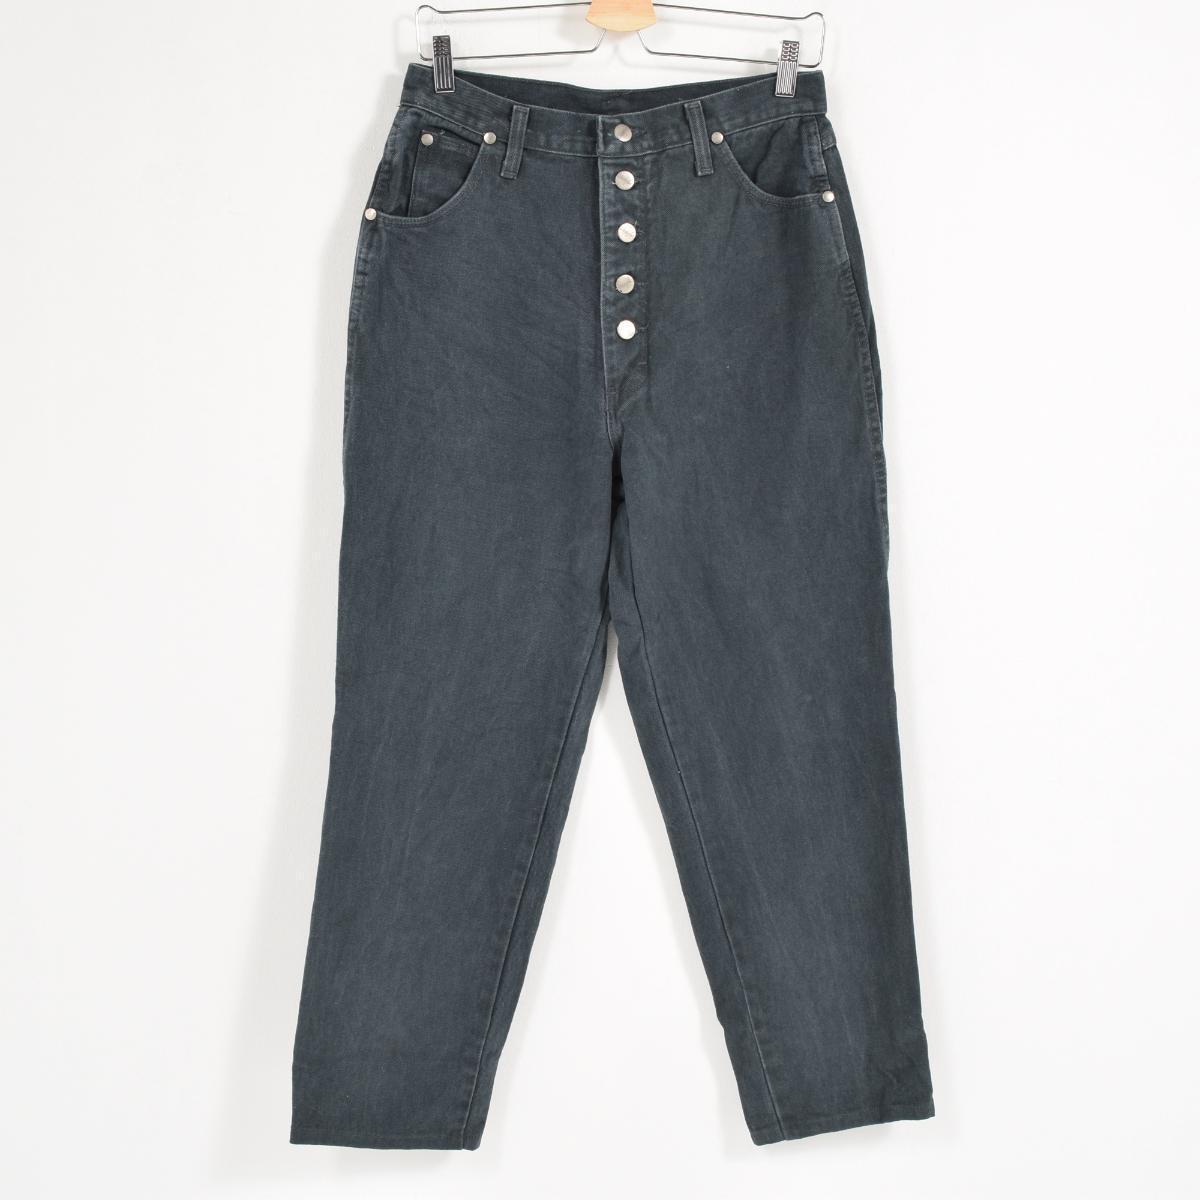 41b4cf70 Men w30 /wad1705 made in Wrangler Wrangler jeans straight denim underwear  USA ...